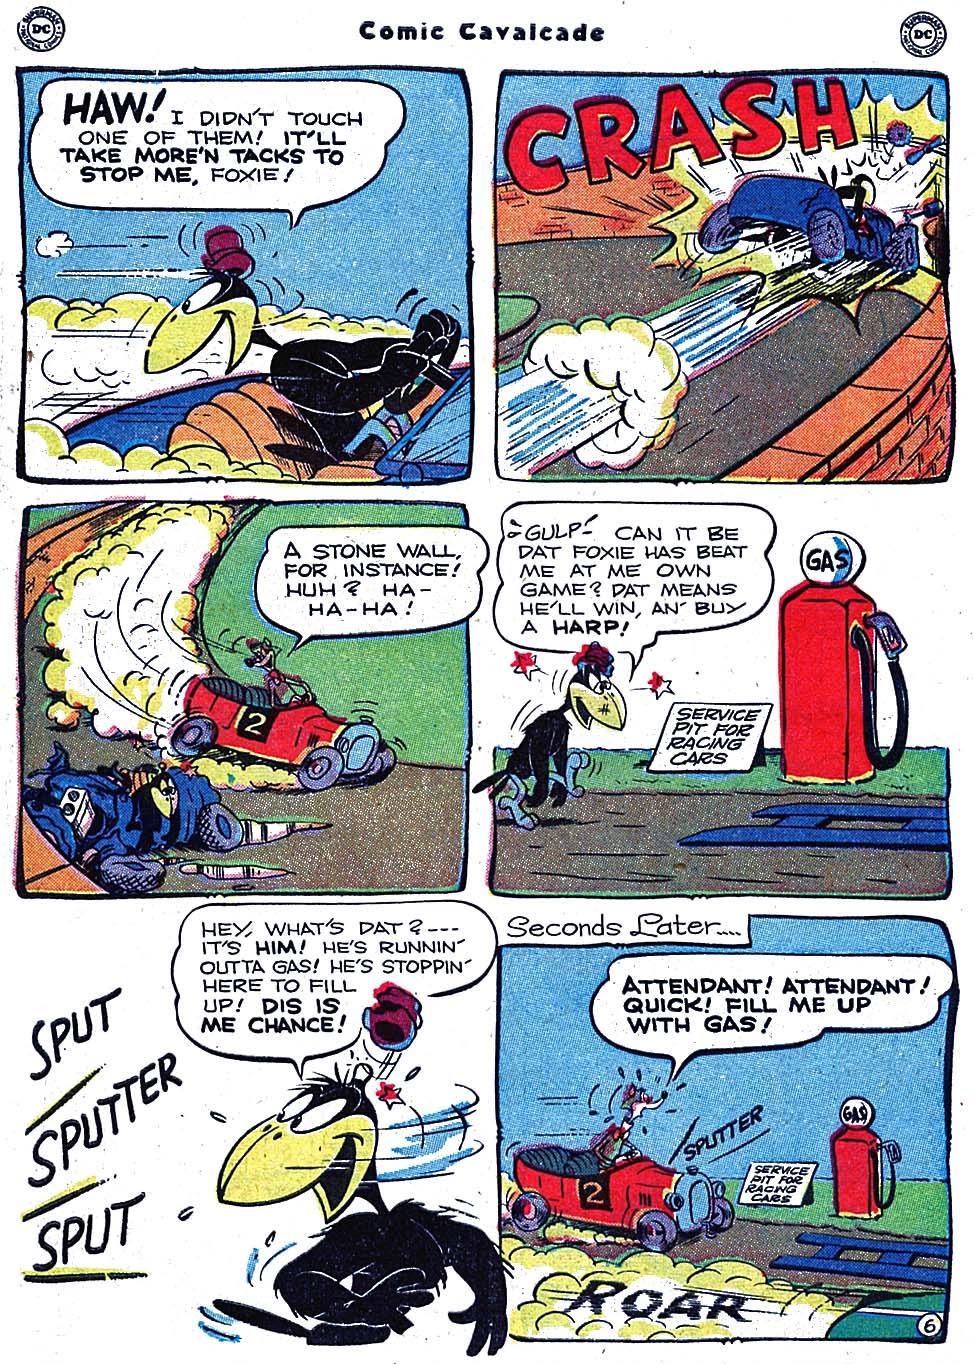 Comic Cavalcade issue 38 - Page 8